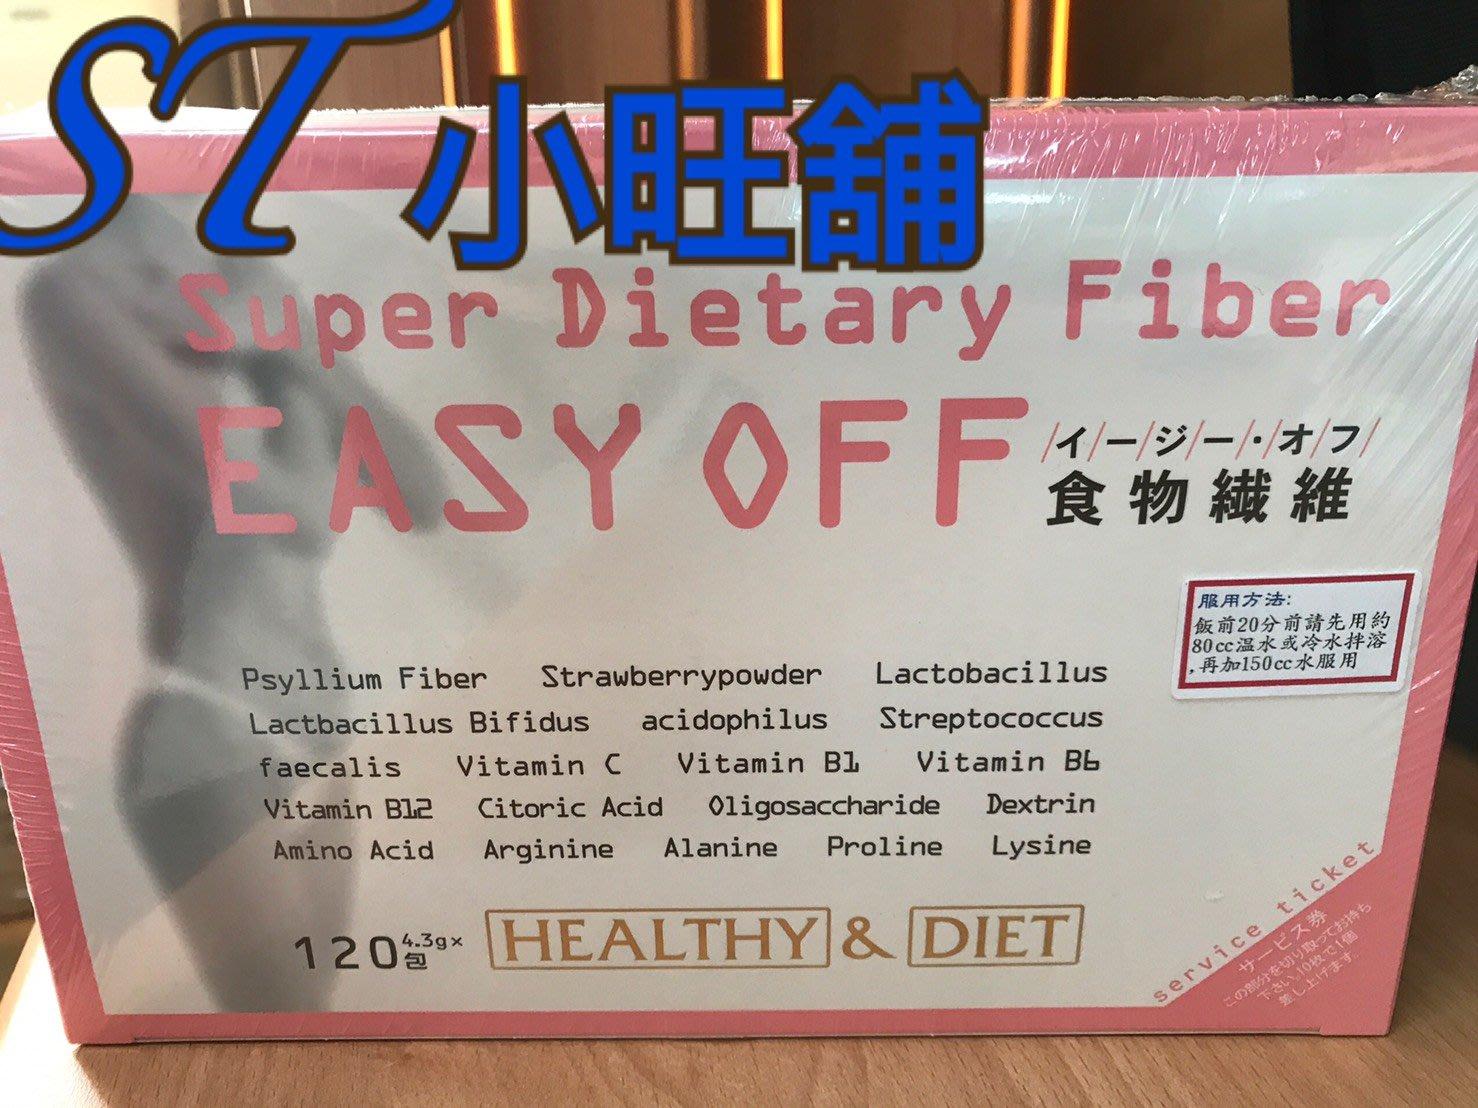 ST 小旺鋪  日本藥王 EASY OFF 食物纖維 飲品